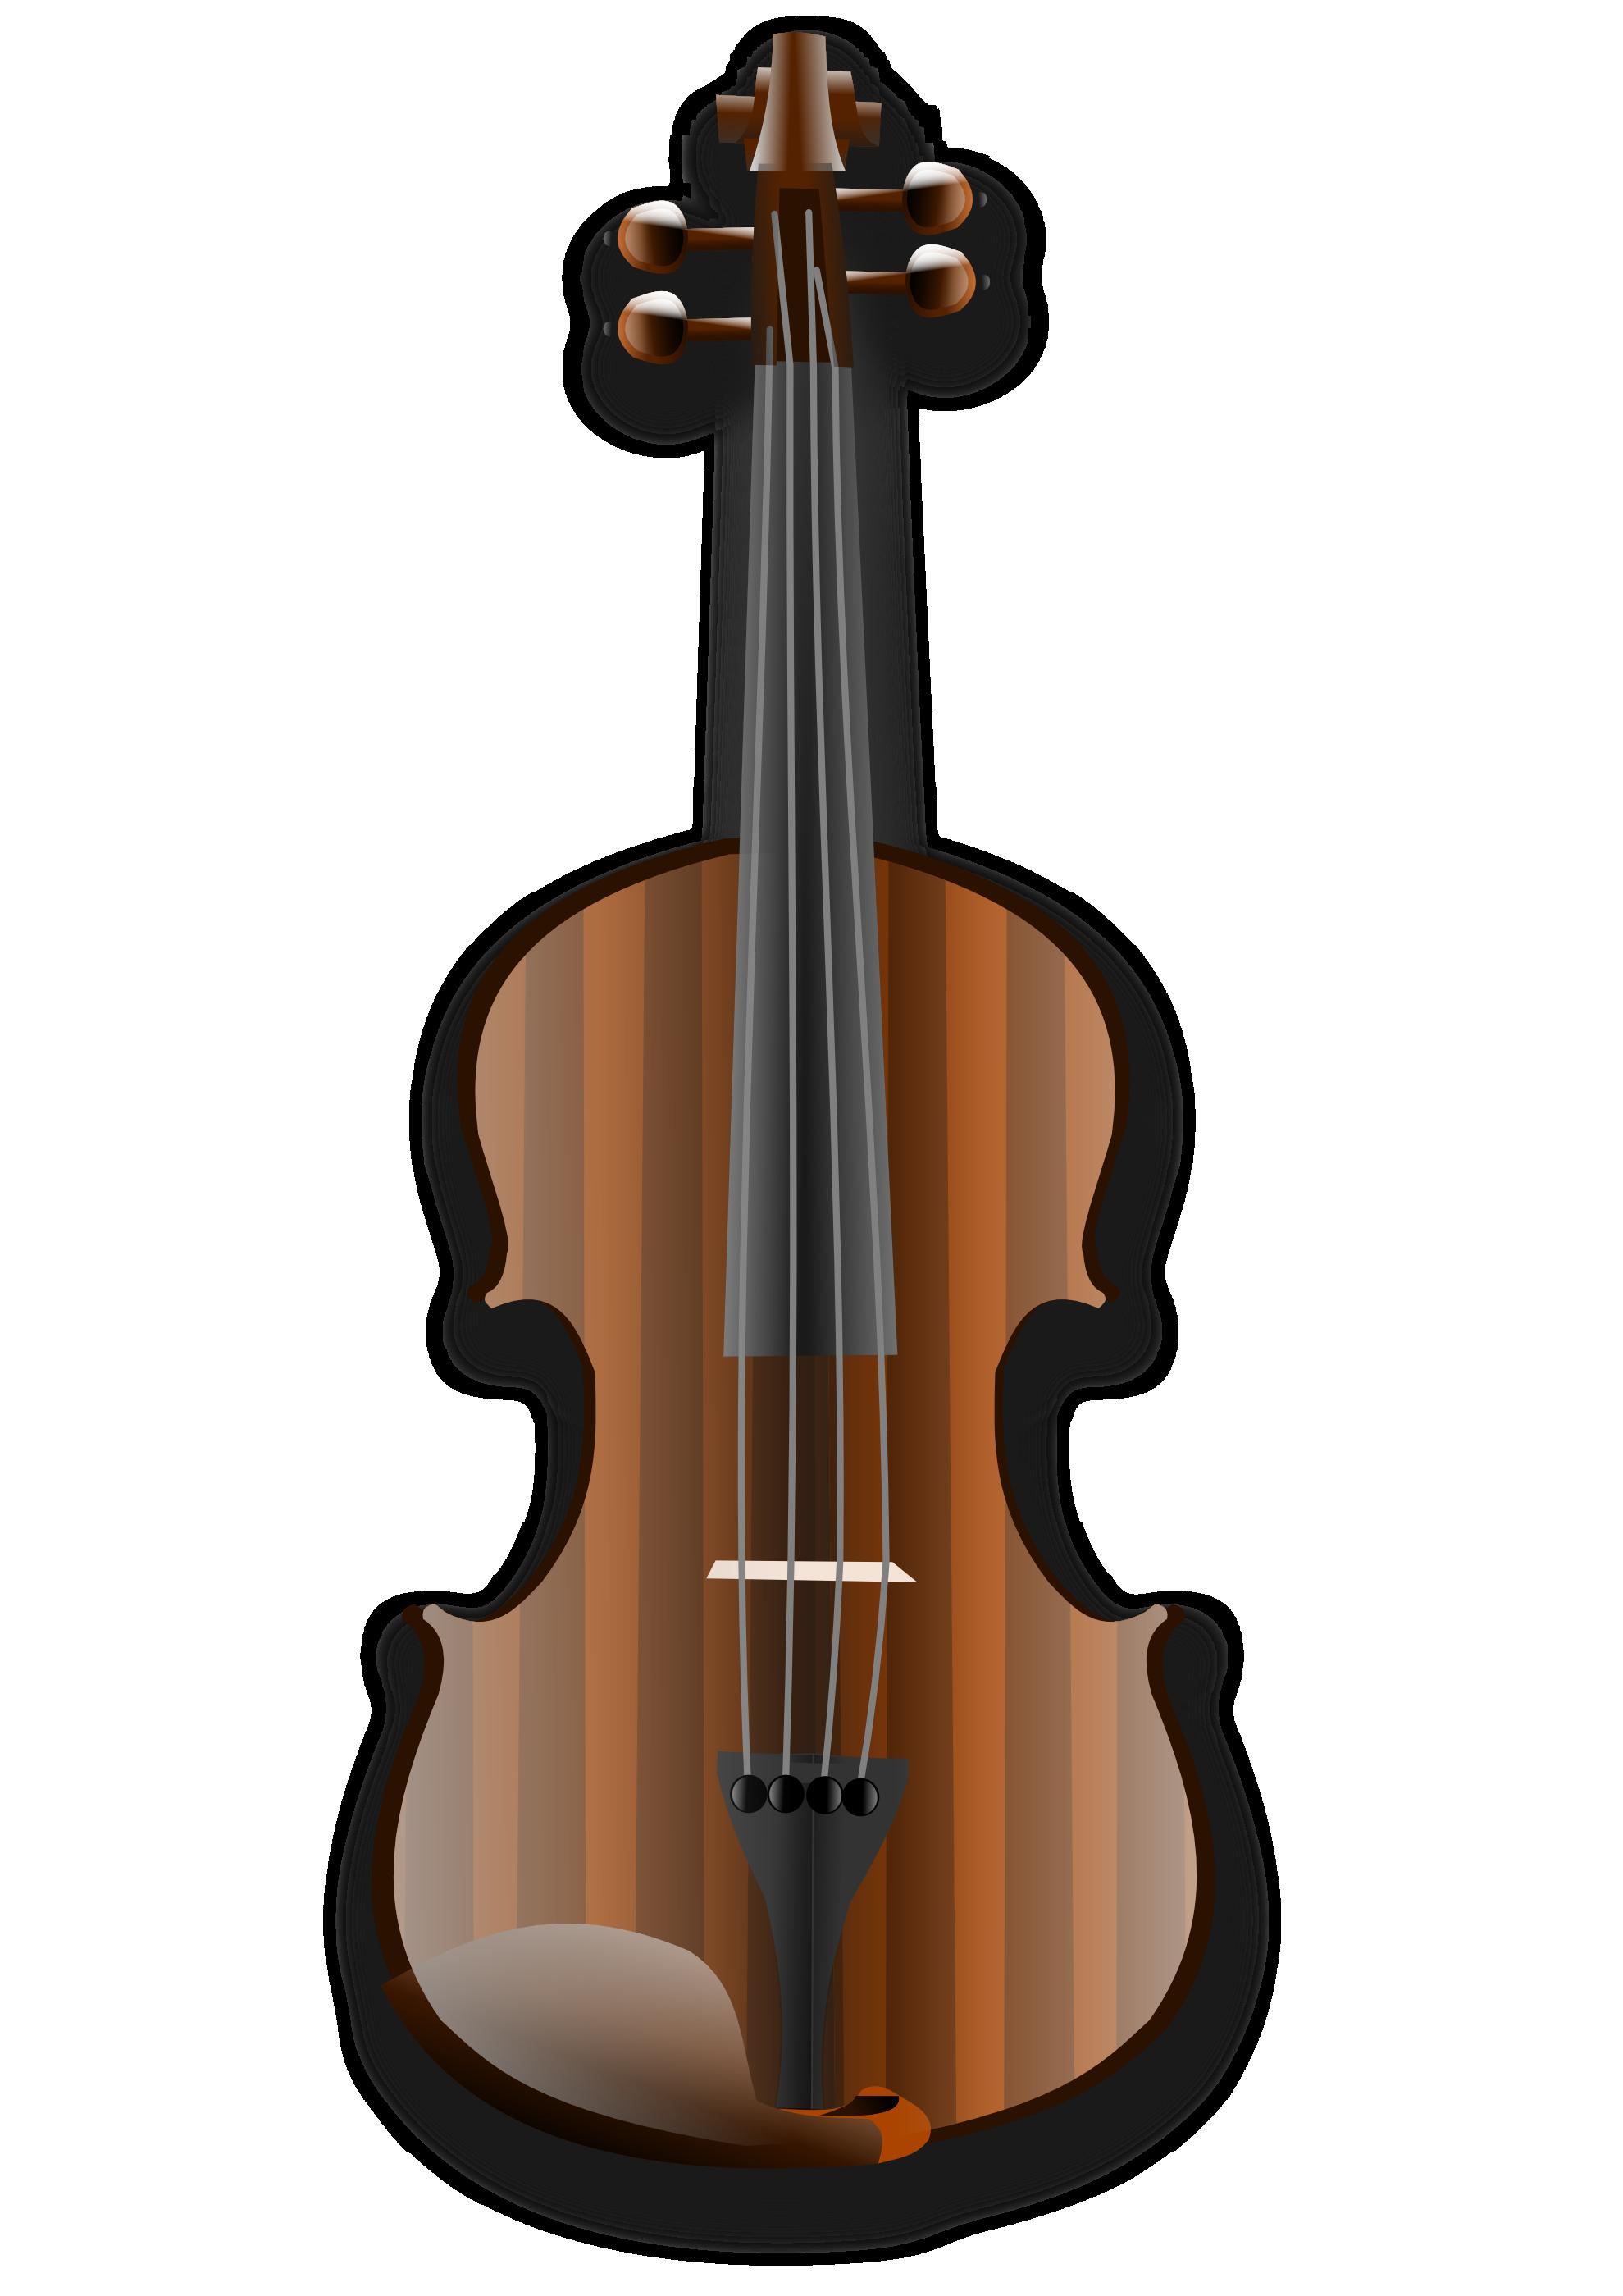 Brown clipart violin Images Violin 49 violin Playing